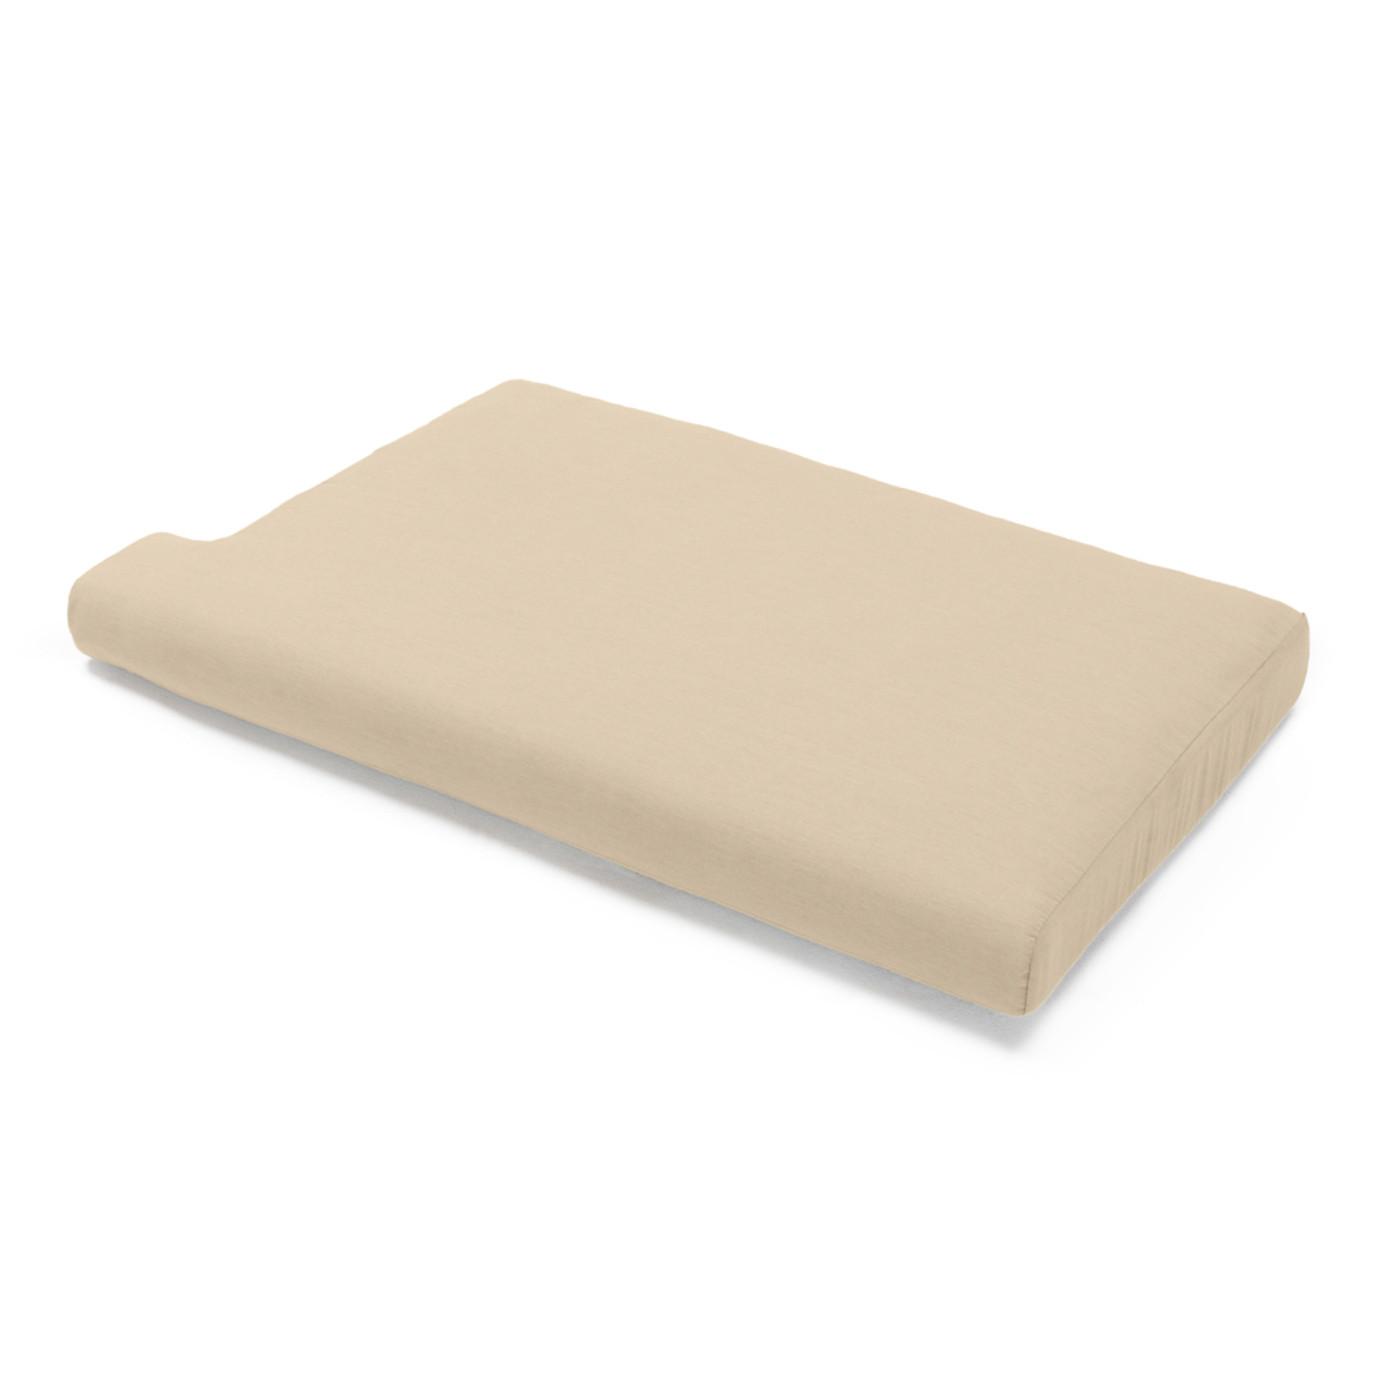 Portofino Comfort 96in Sofa Right Base Cushion - Heather Beige